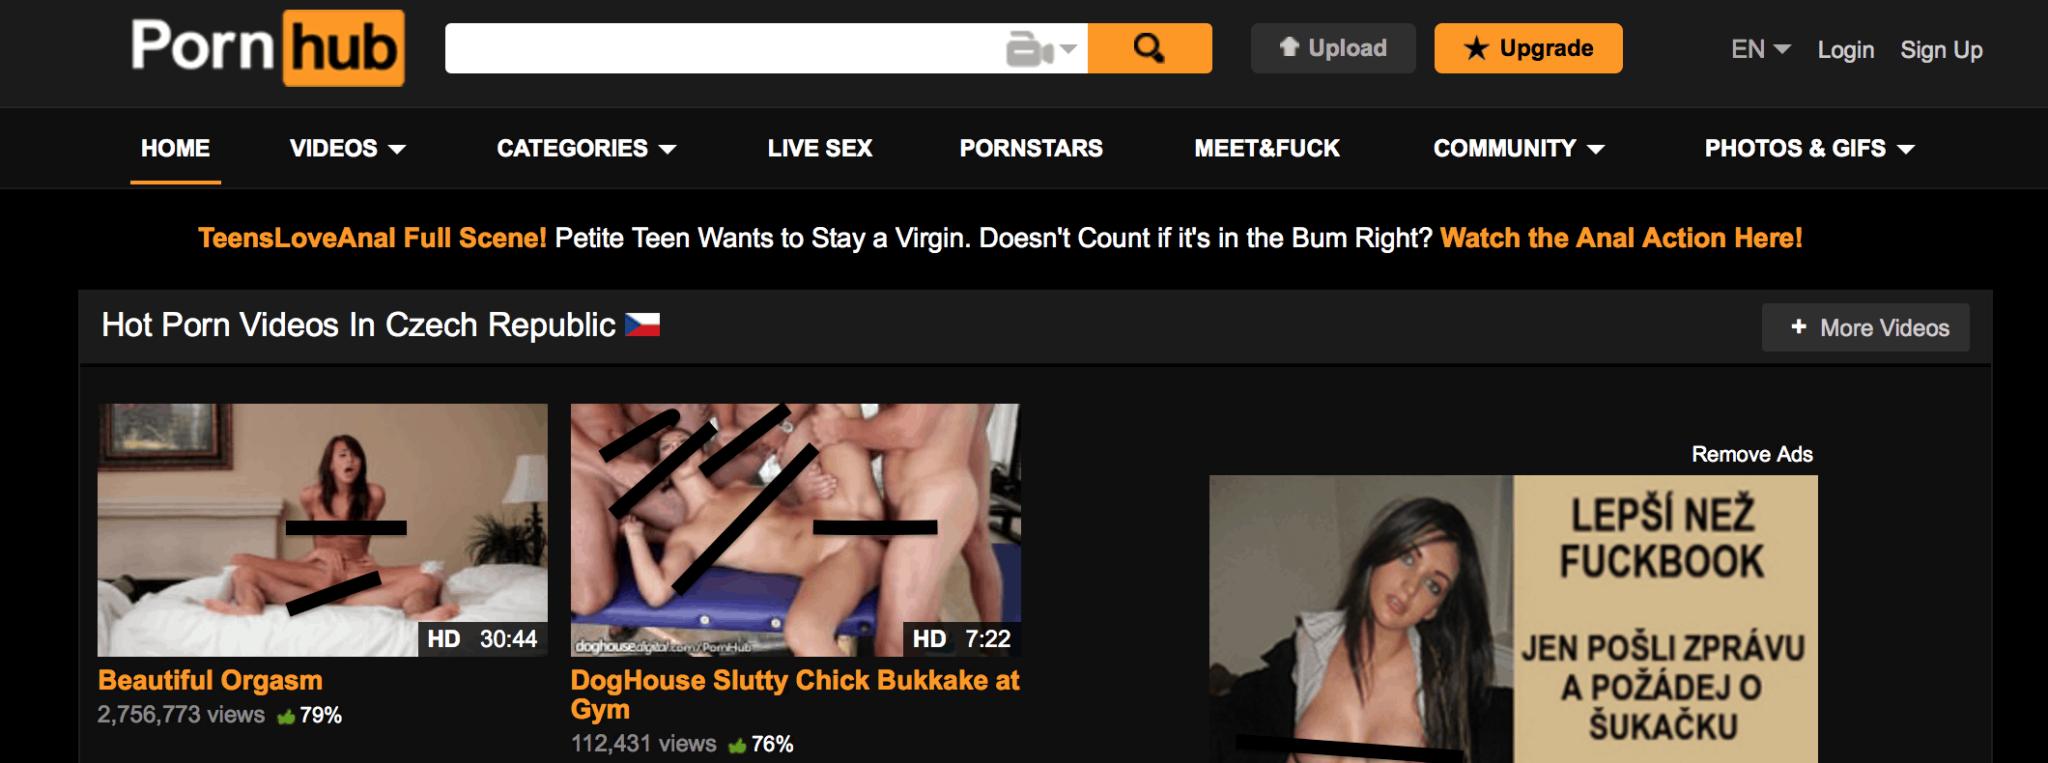 nejlepší extrémní porno filmy